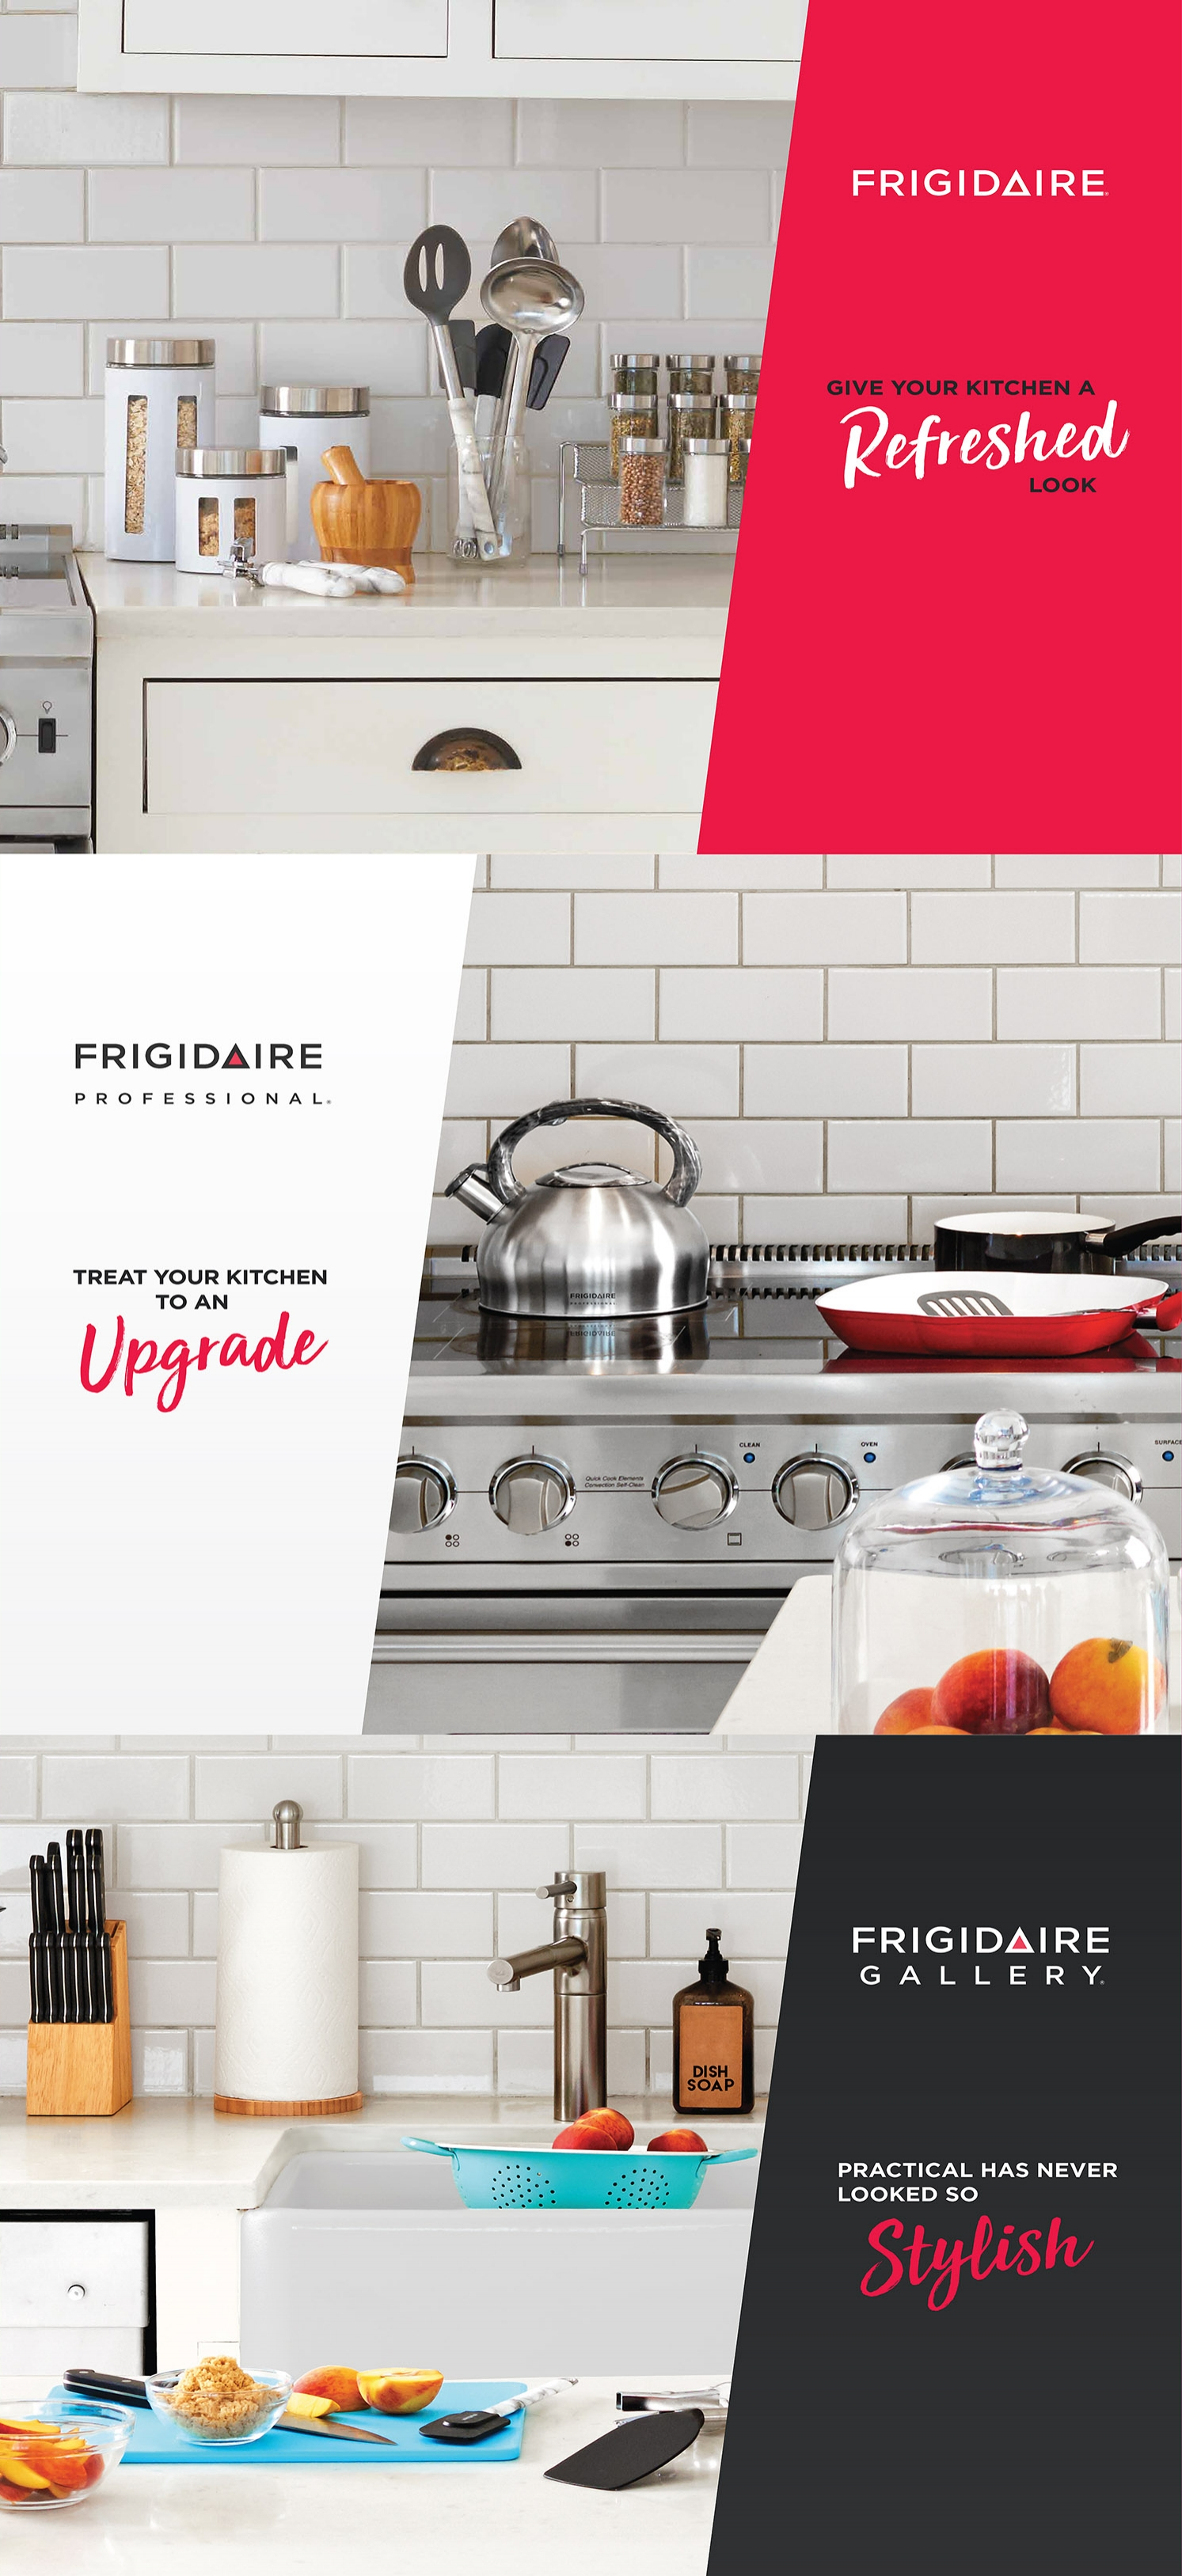 Frigidaire+Poster+2018.jpg